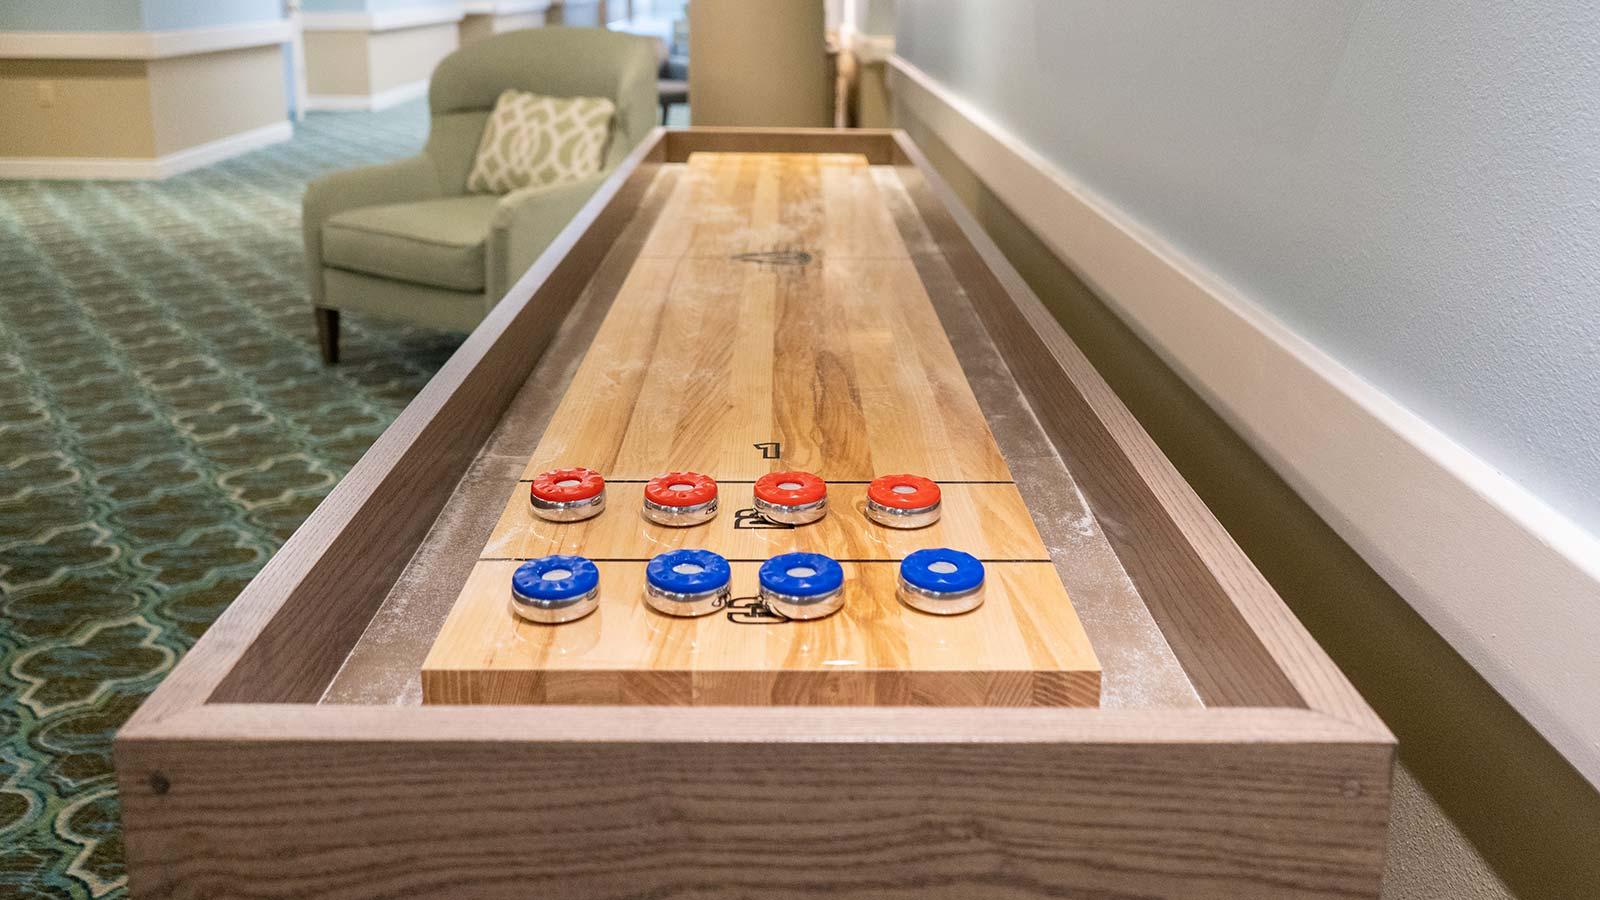 Shuffleboard table at Heron Club assisted living and memory care in Sarasota Florida